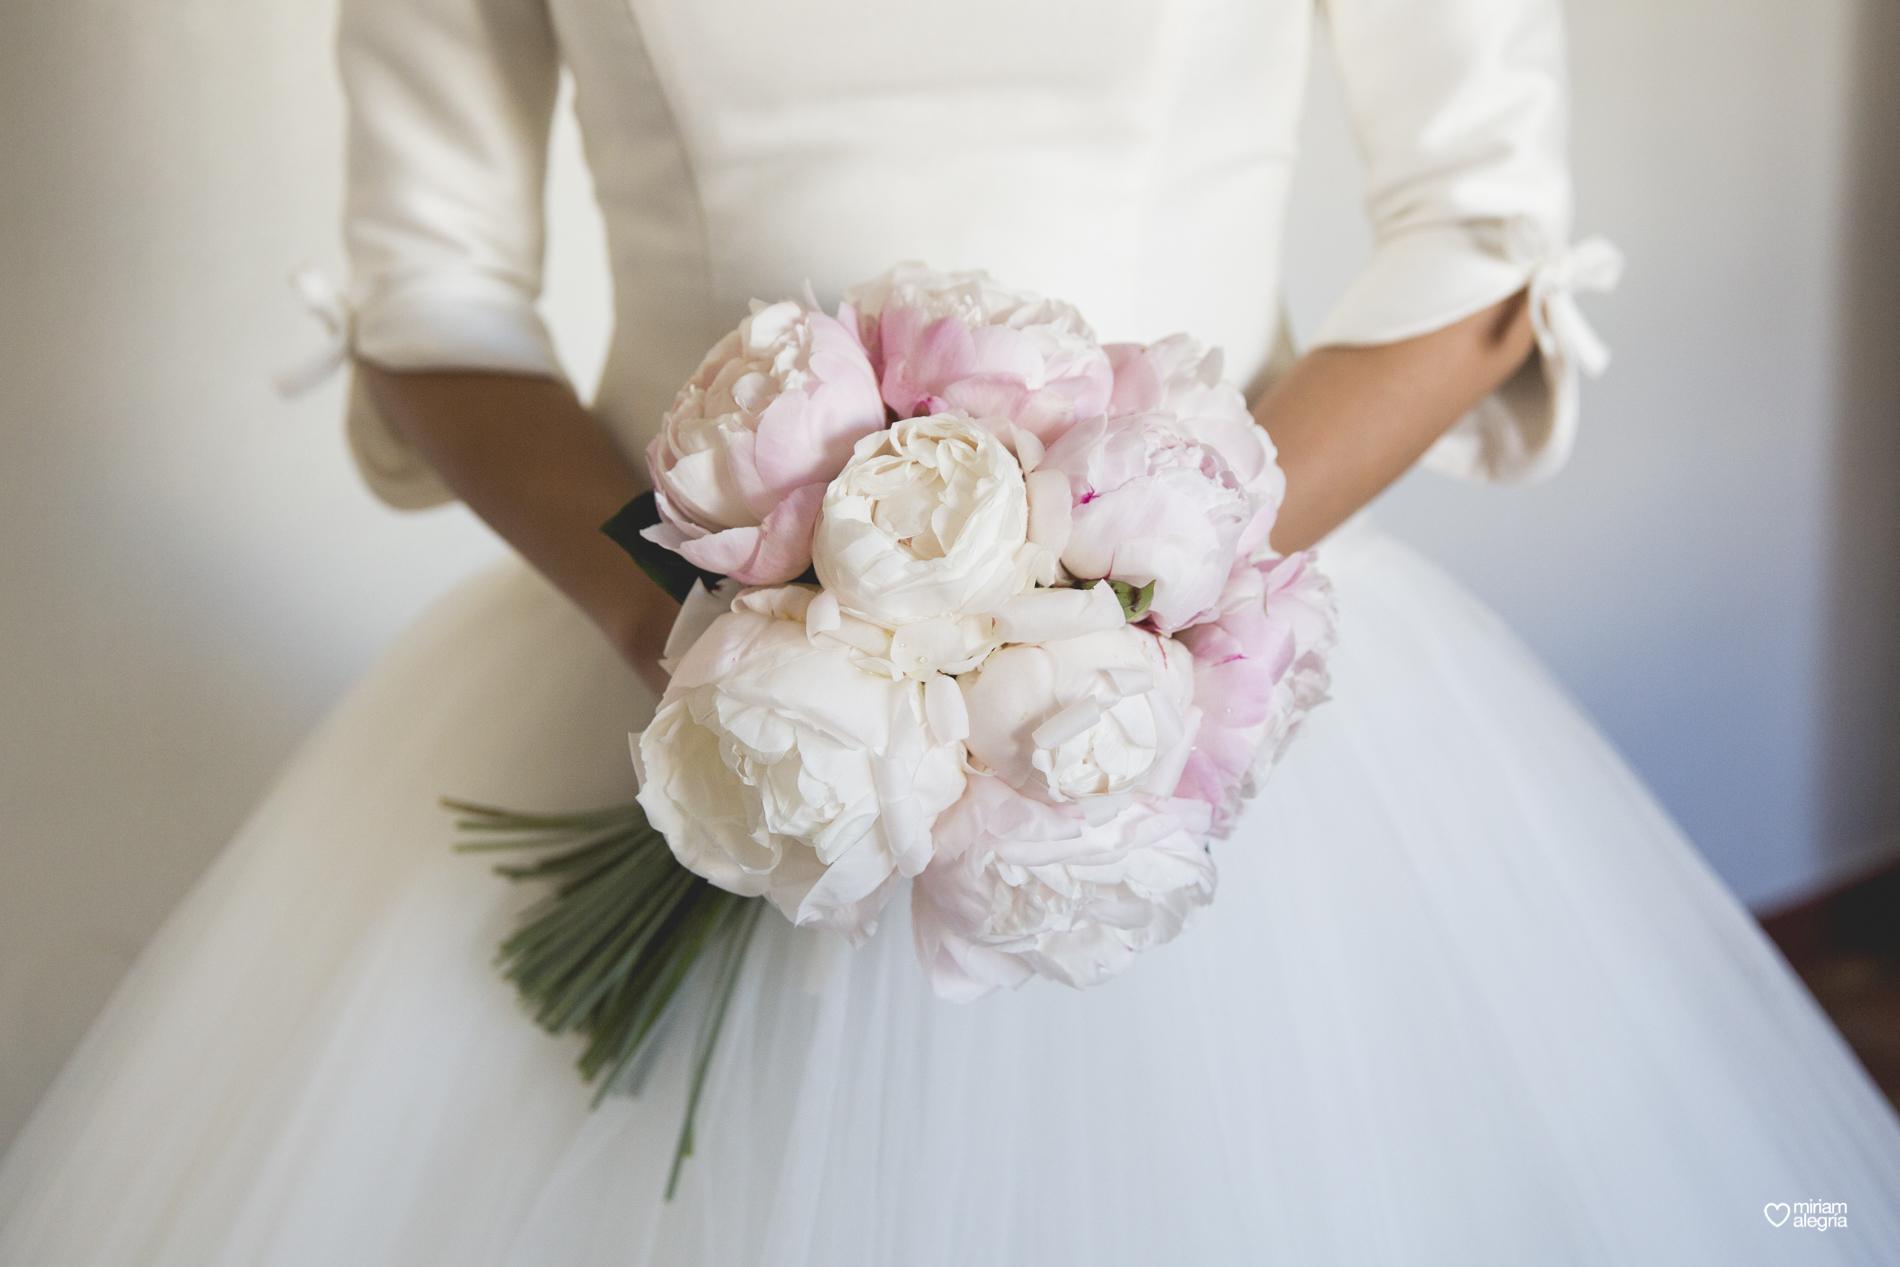 boda-en-la-catedral-de-murcia-miriam-alegria-fotografos-boda-murcia-24